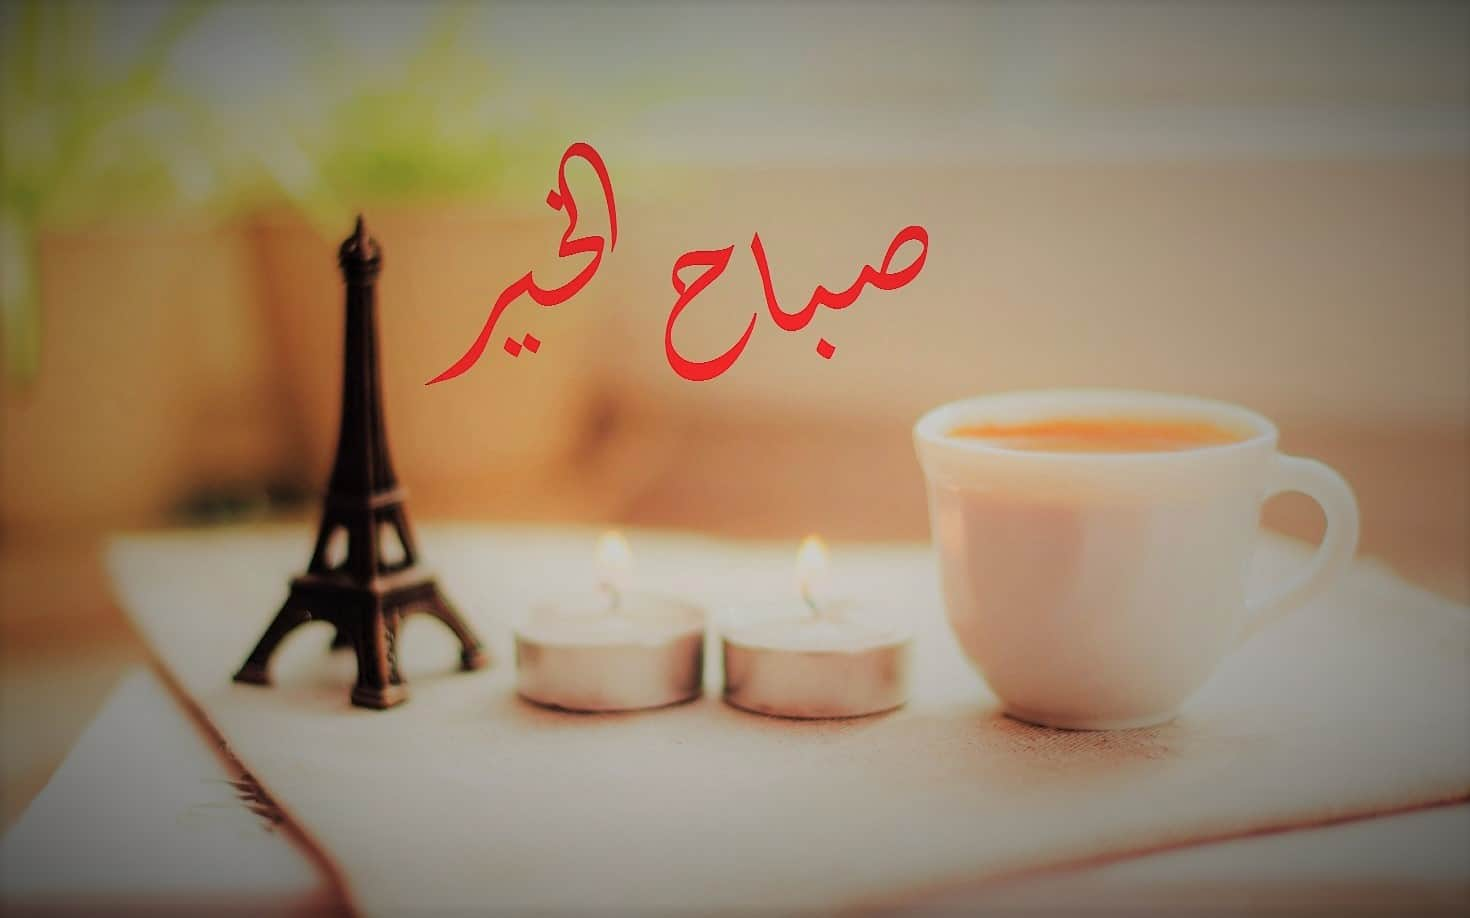 بالصور احلى صباح , صباحكم حلو وجميل 3519 11